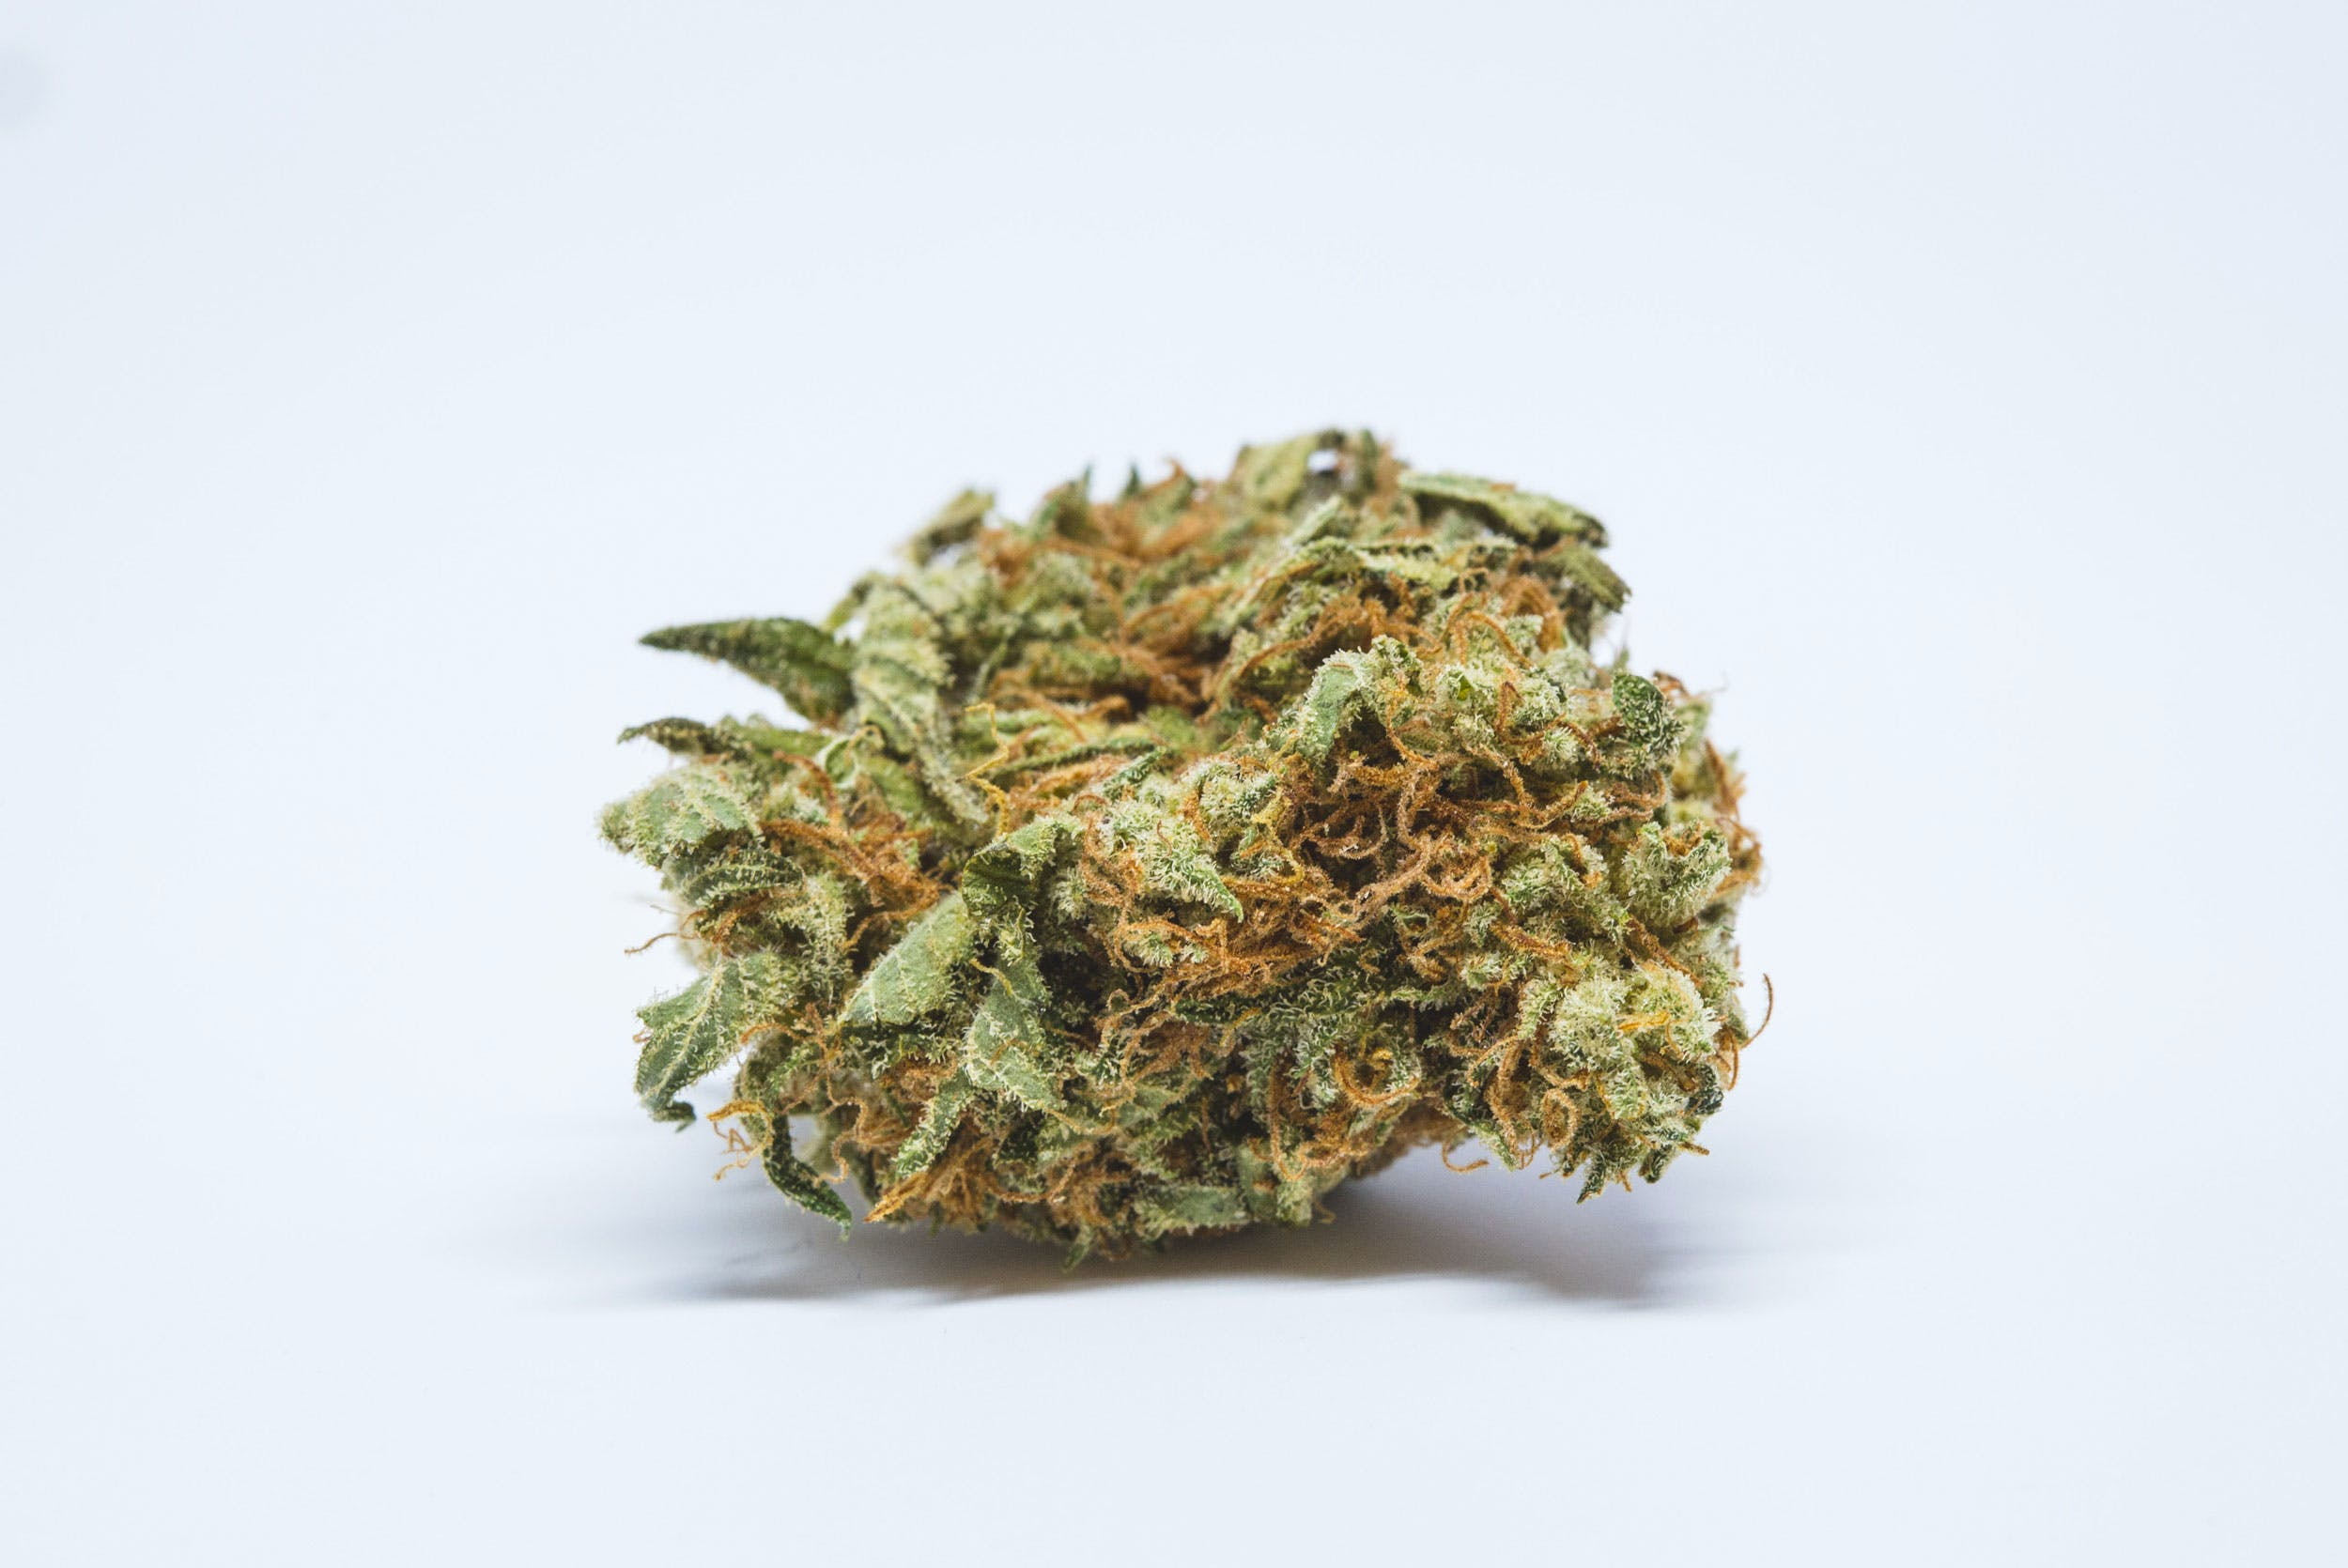 Chernobyl Marijuana Strain 10 Best Strains For Halloween